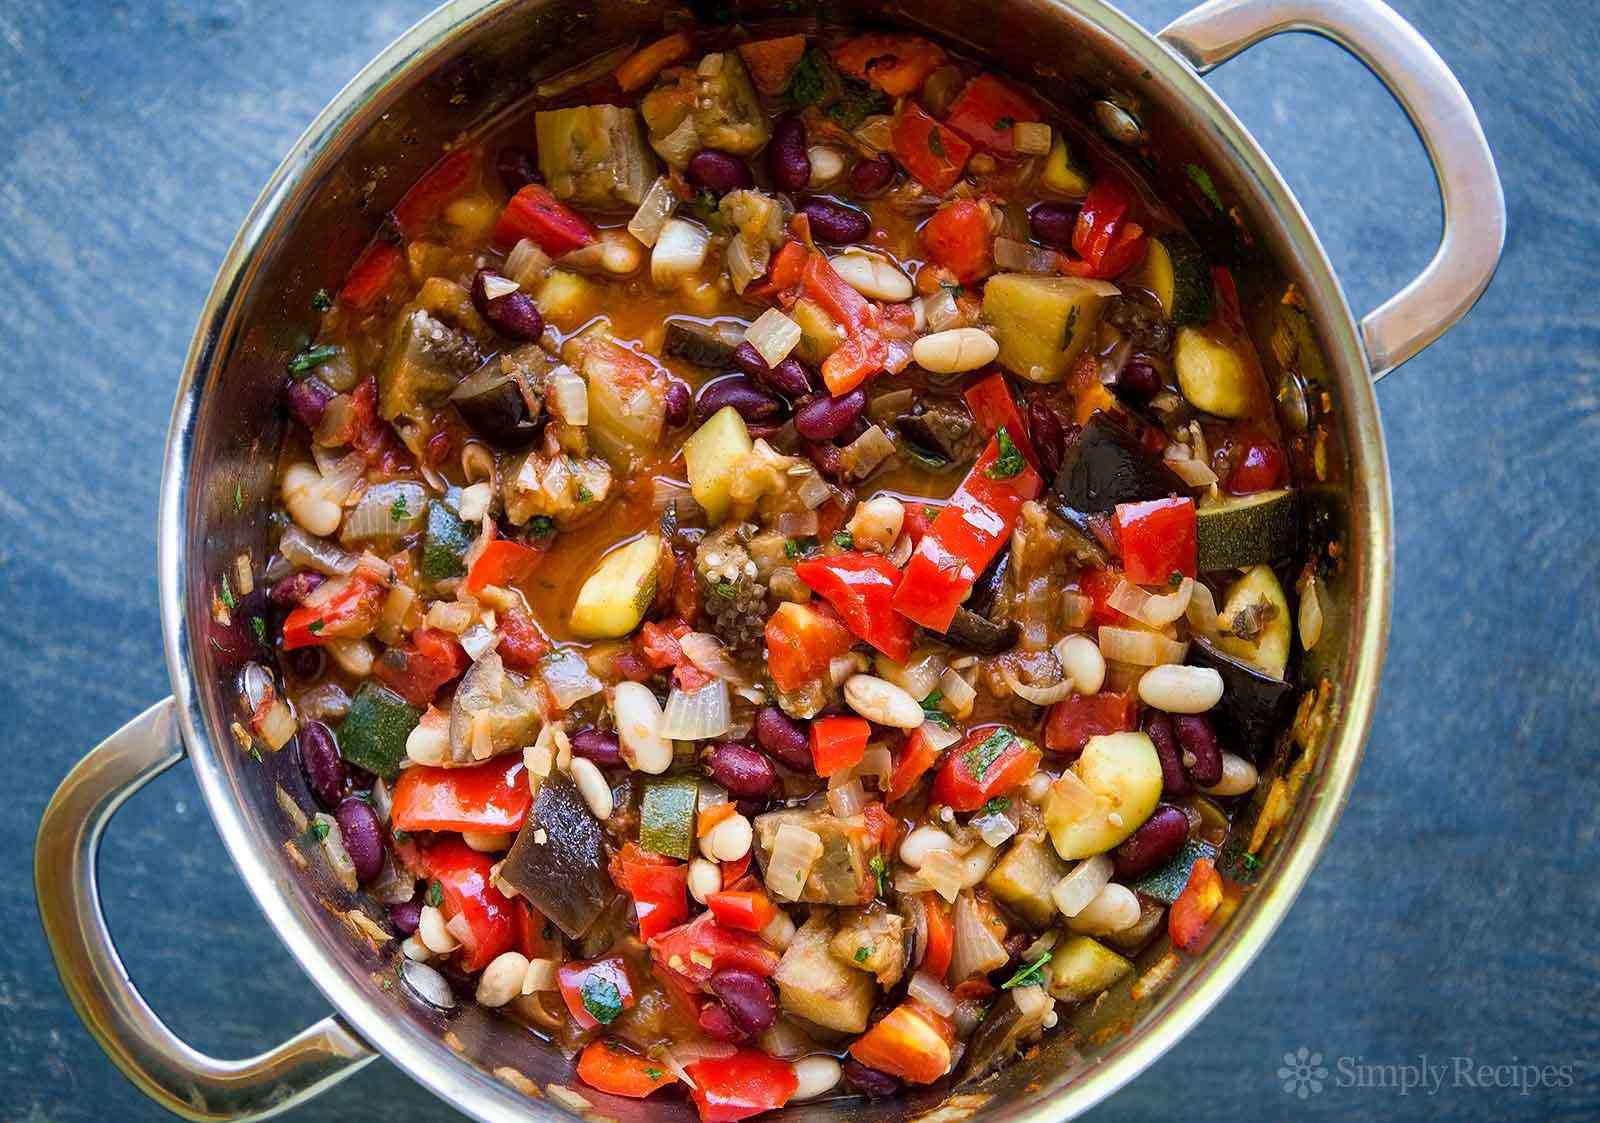 Vegetable Meatless Chili